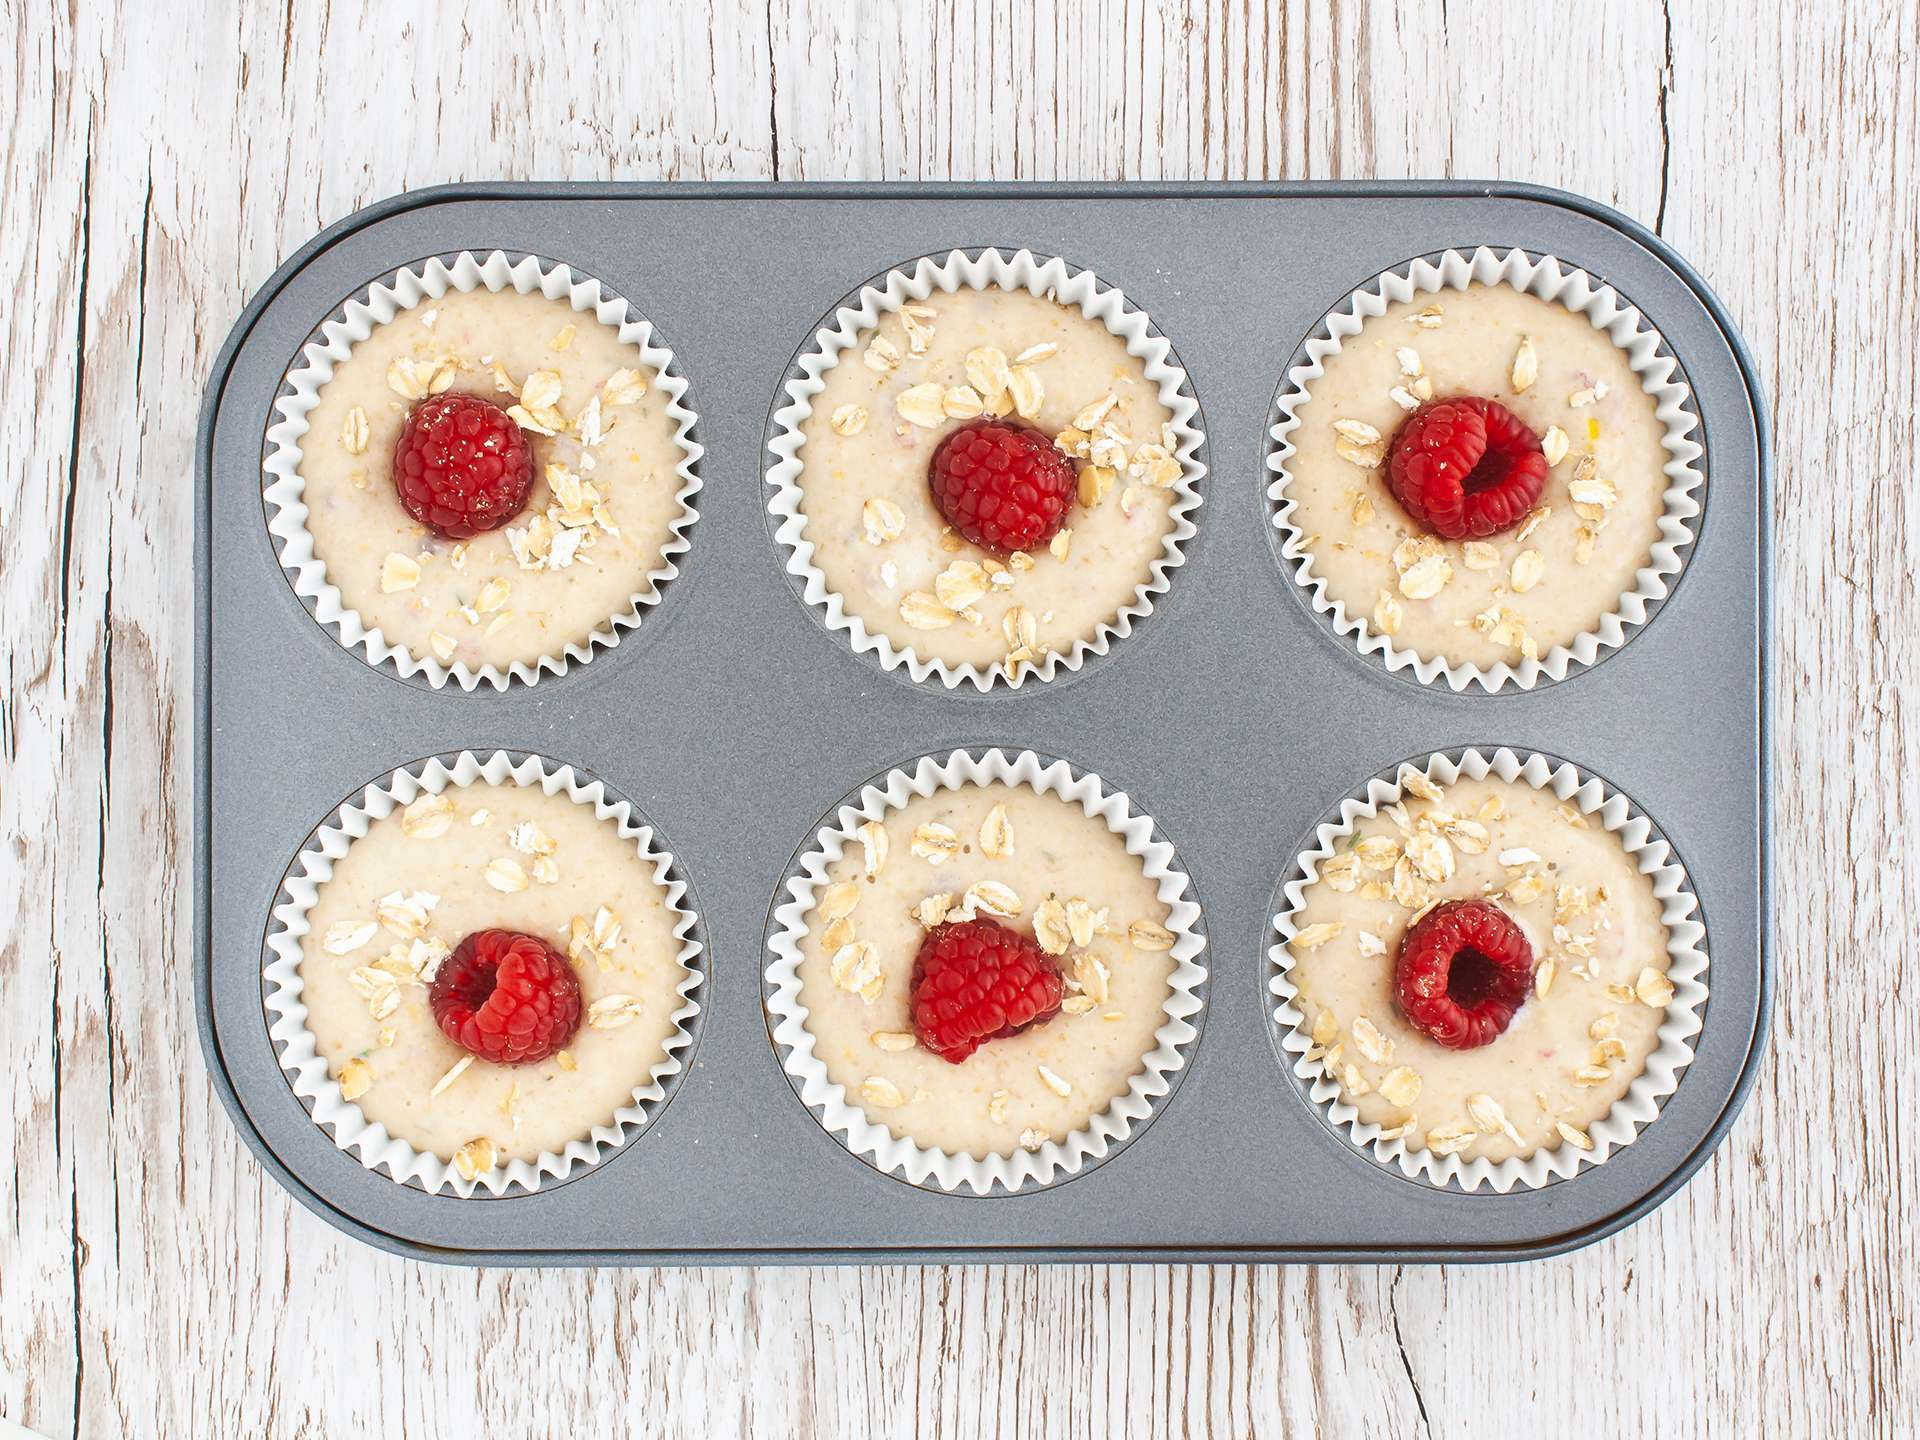 Step 3.1 of Gluten Free Raspberry Muffins Recipe